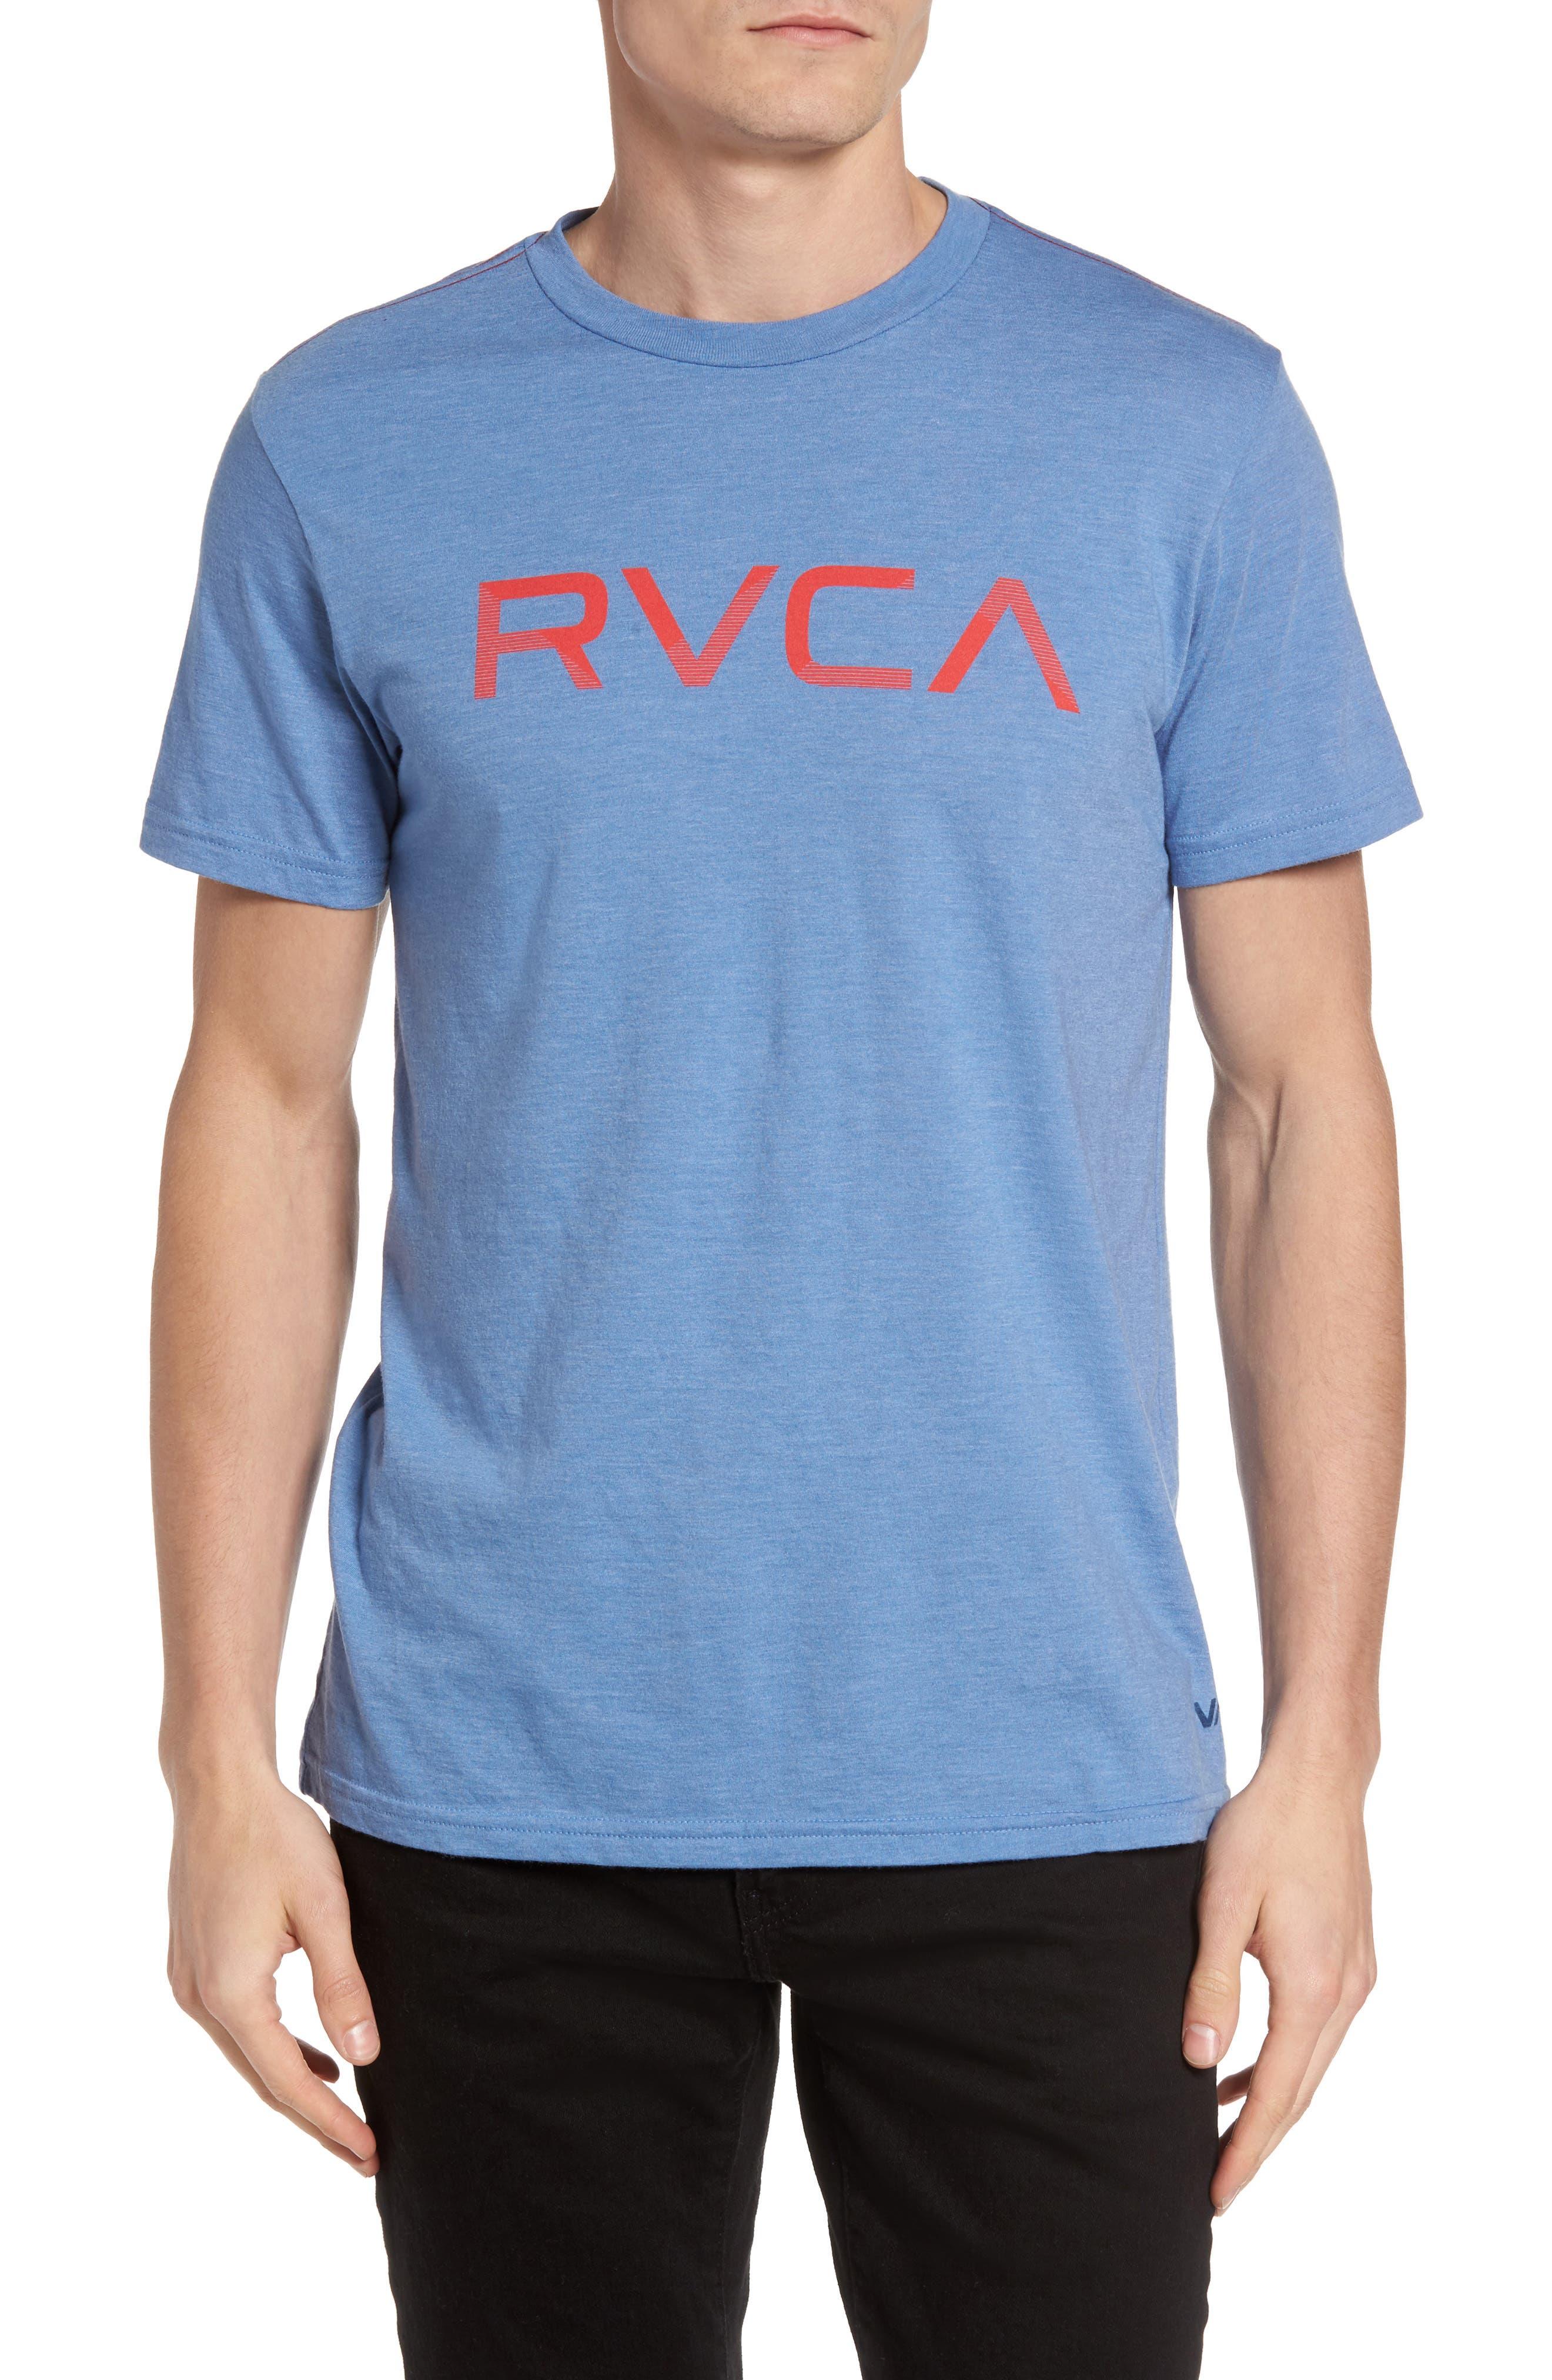 RVCA Shade Graphic T-Shirt